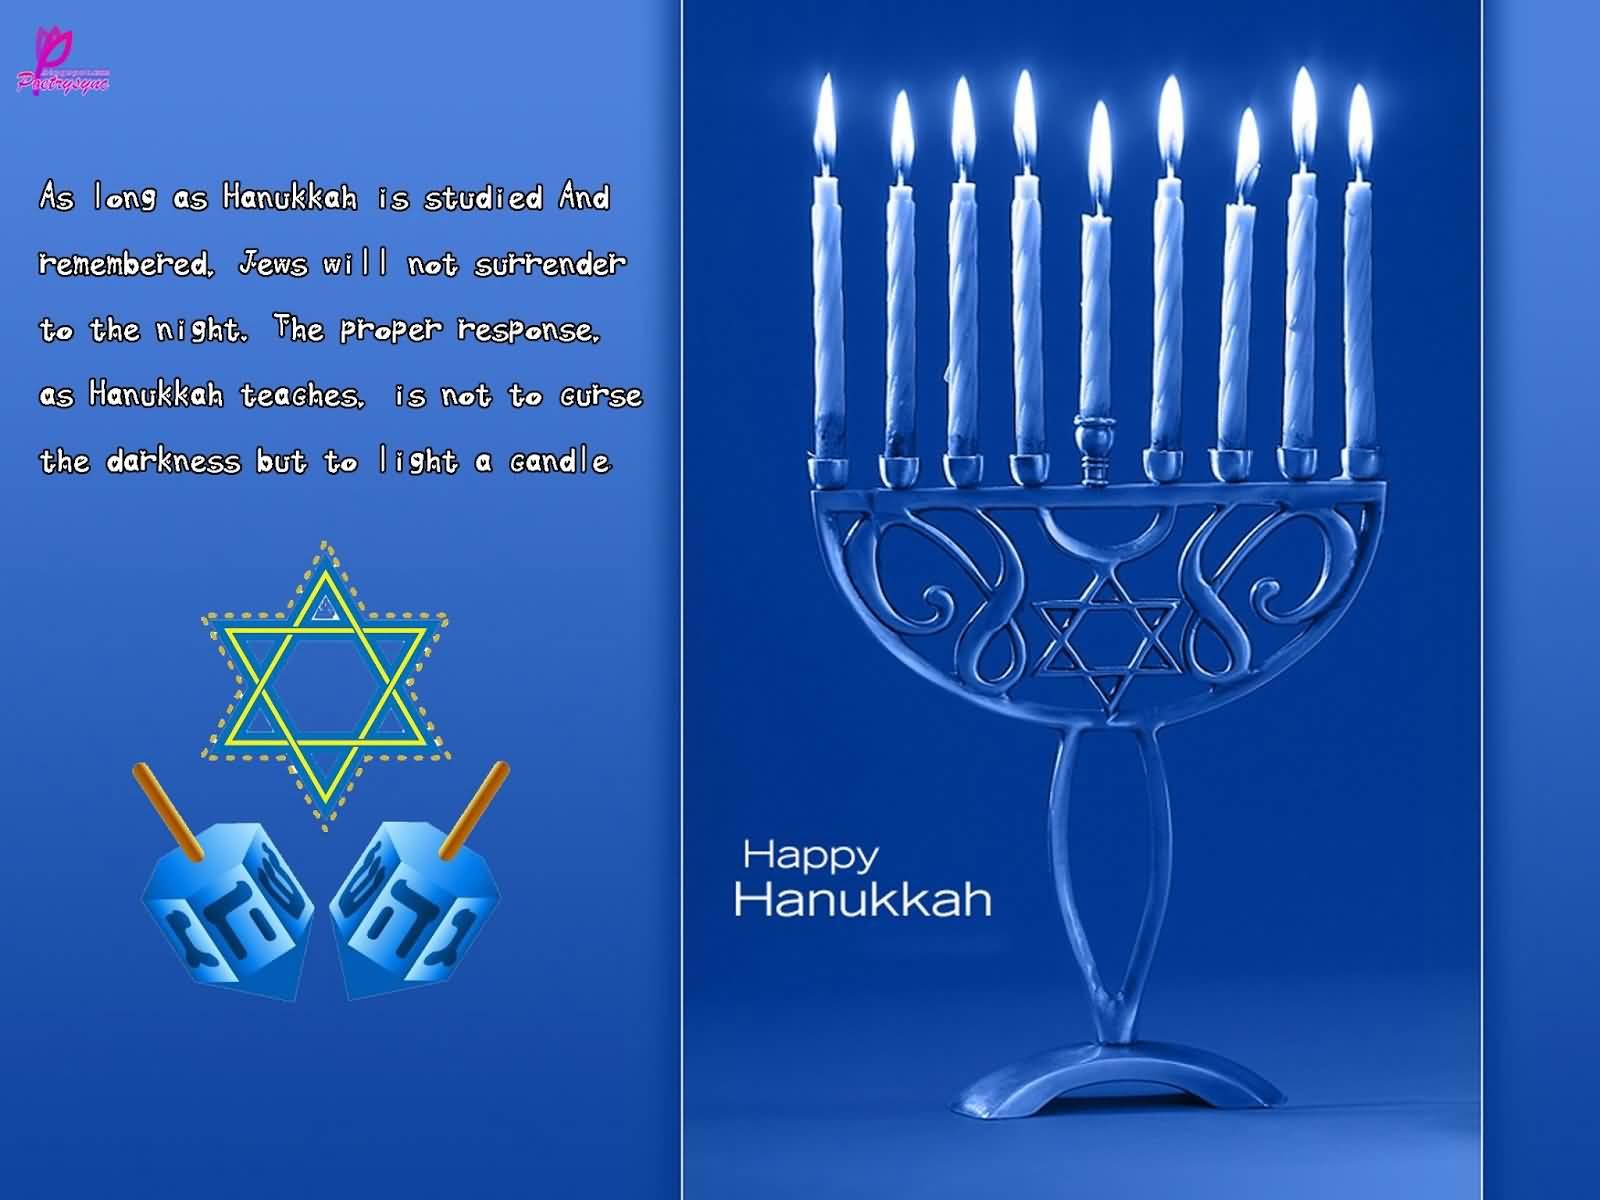 65 beautiful hanukkah greeting pictures happy hanukkah wishes card m4hsunfo